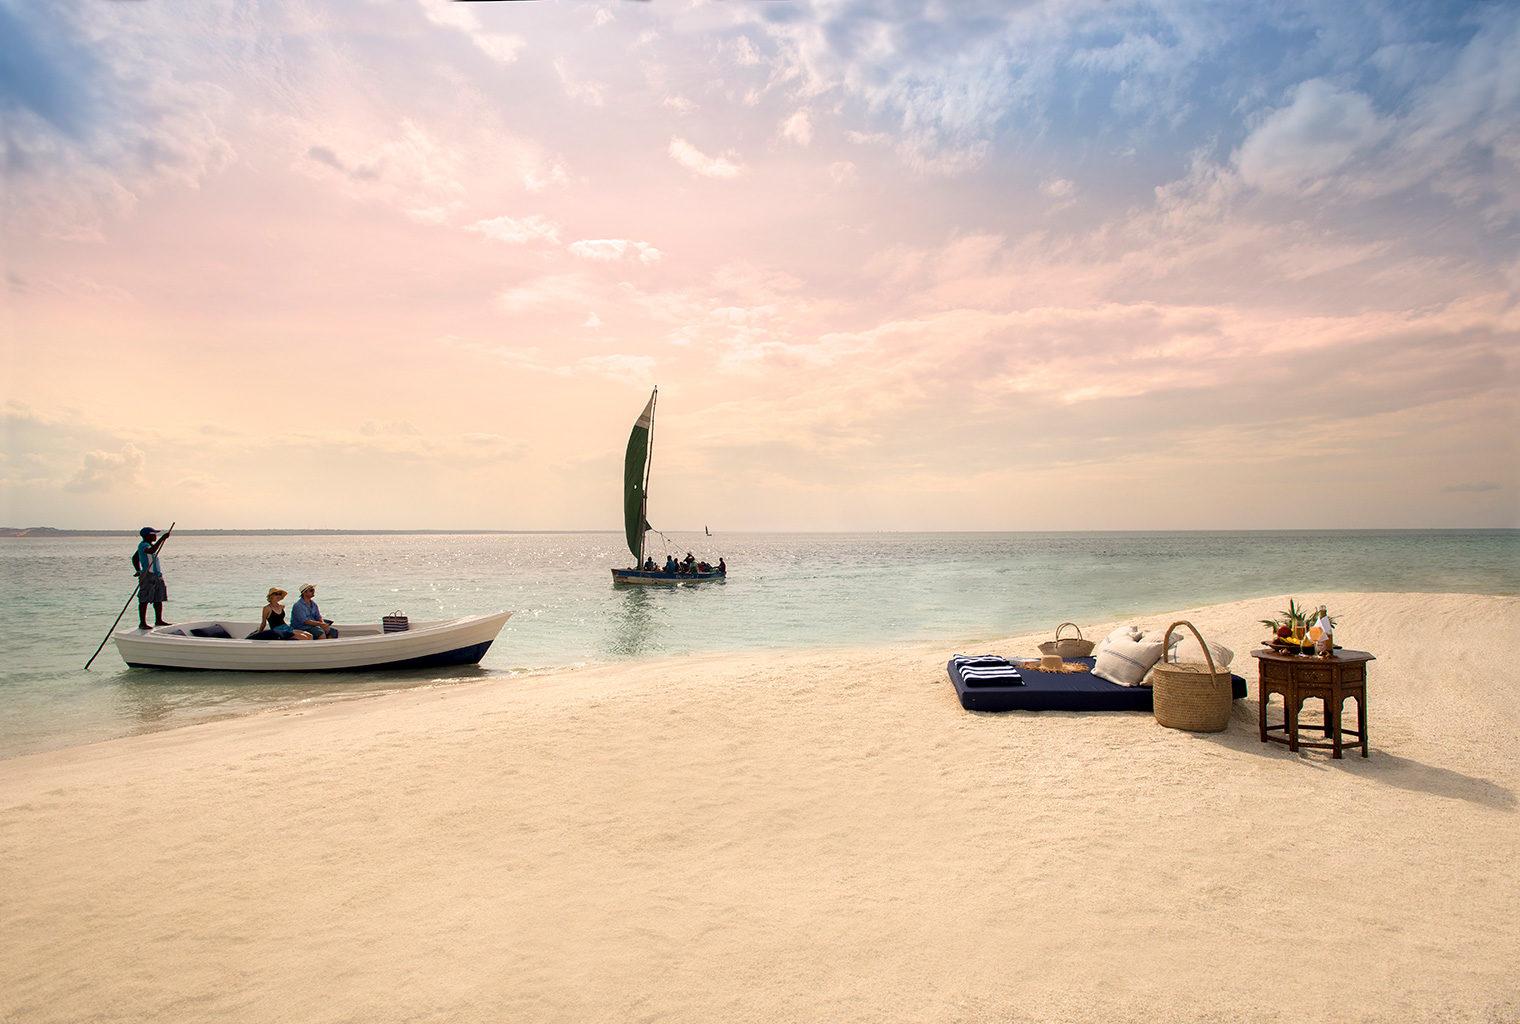 Mozambique-Bazaruto-Archipelago-Benguerra-Island-Lodge-Boating-Picnic